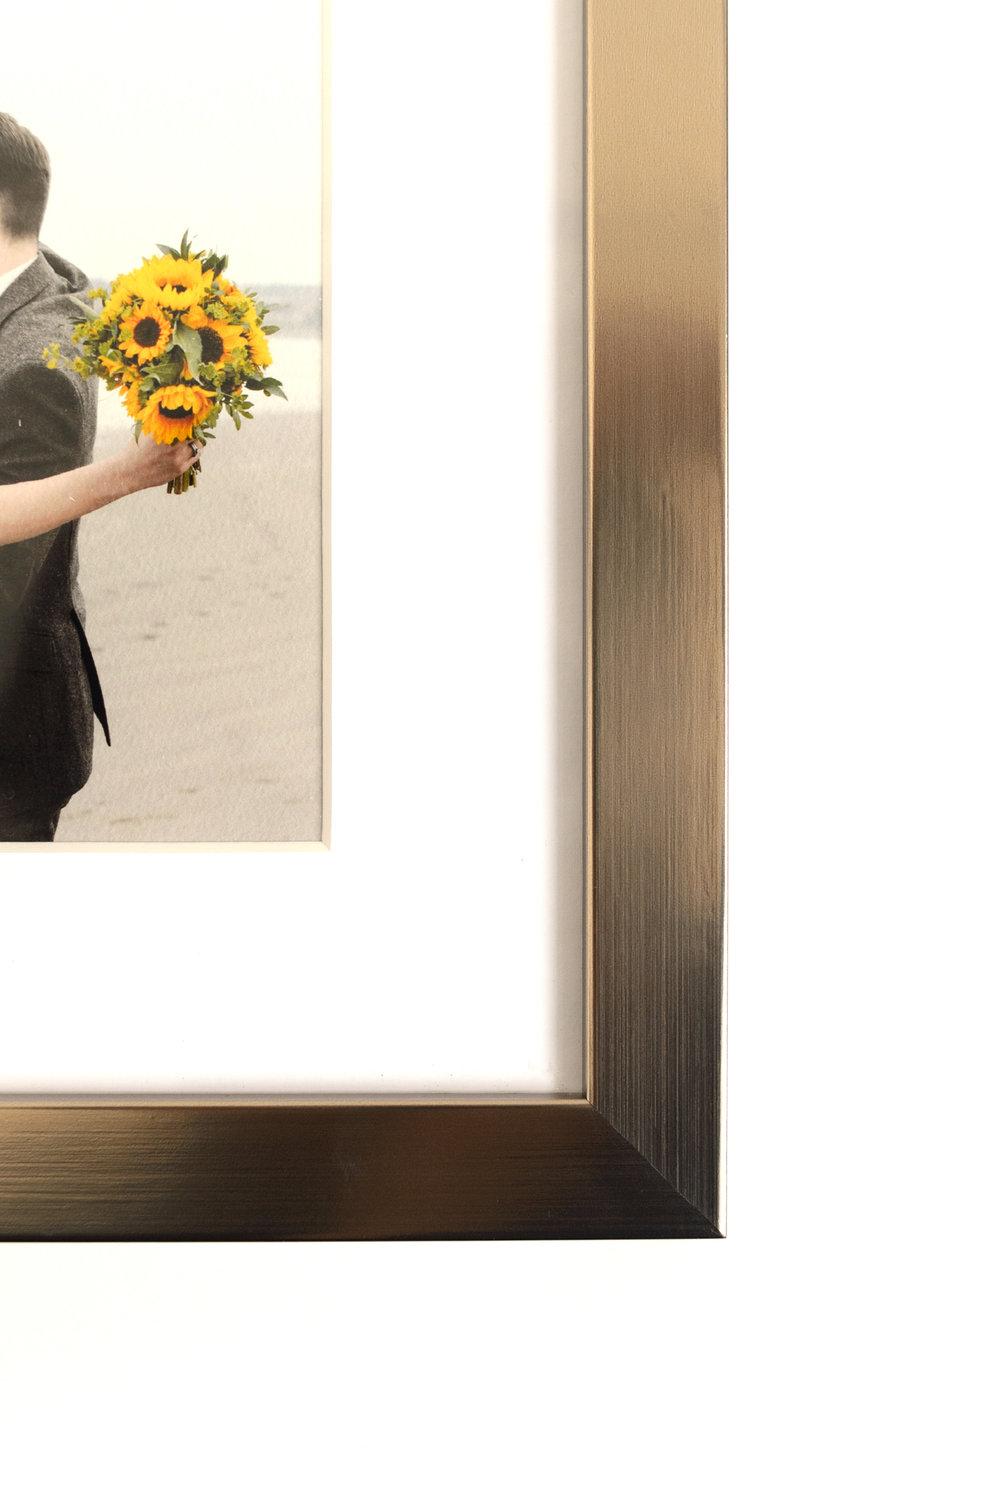 "Braemar, 21"" x 8"" print, satin chrome frame"